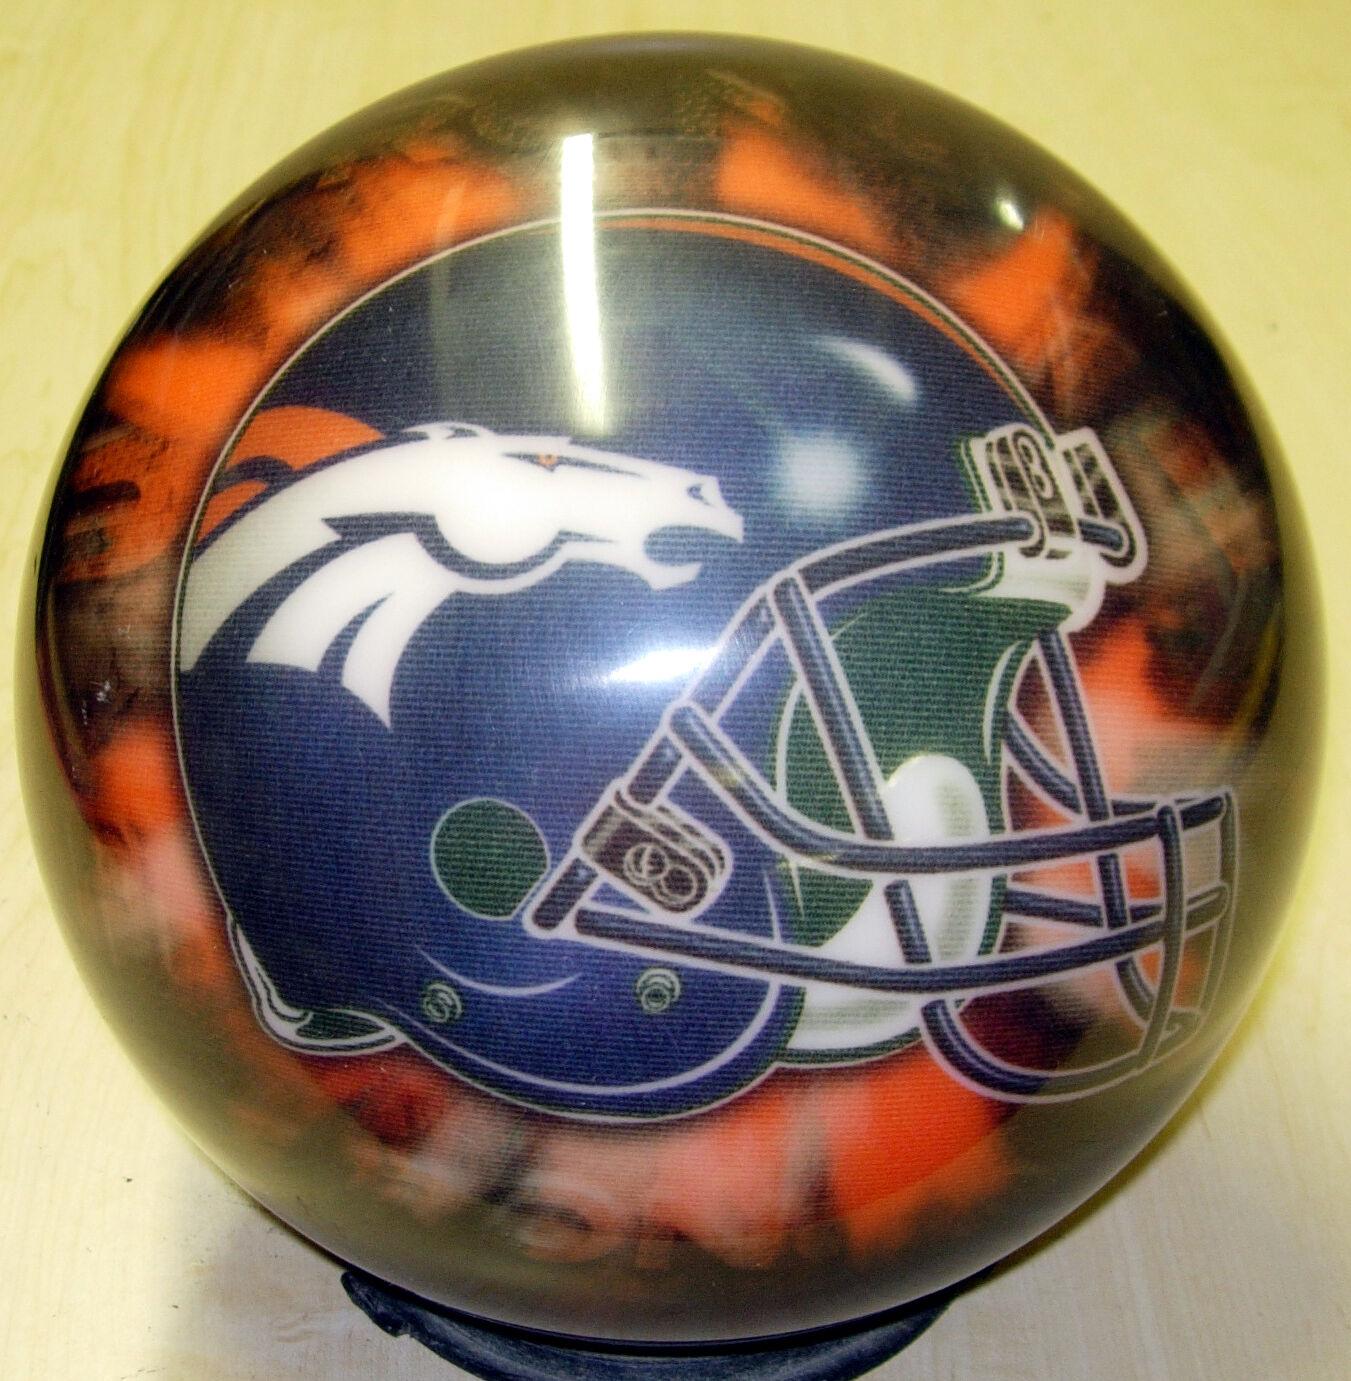 14NIB 2006 HELMET Style OTB VIZ-A-BALL NFL Denver BRONCOS Bowling Ball